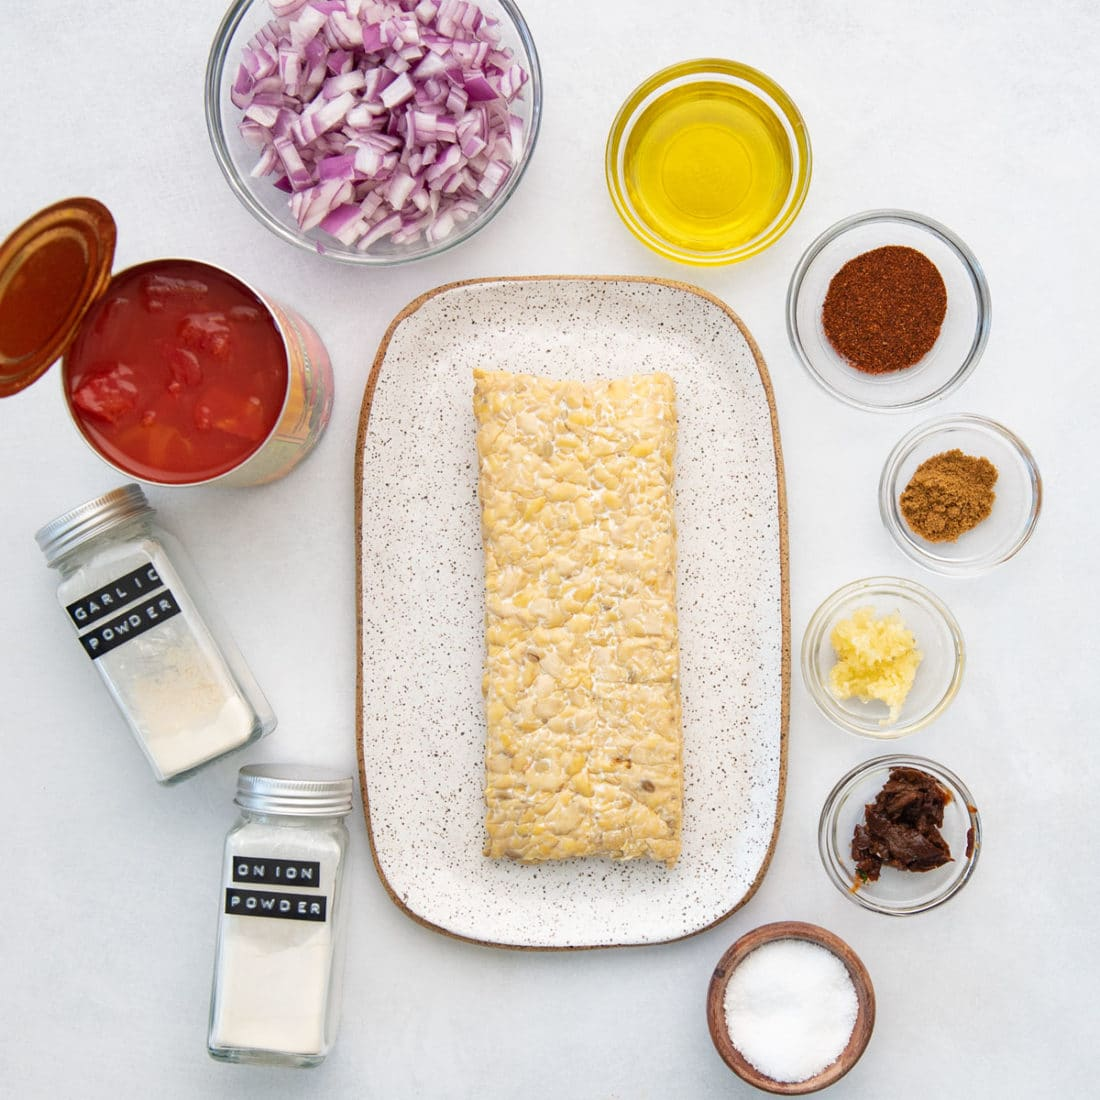 plant-based ingredients for vegan tacos